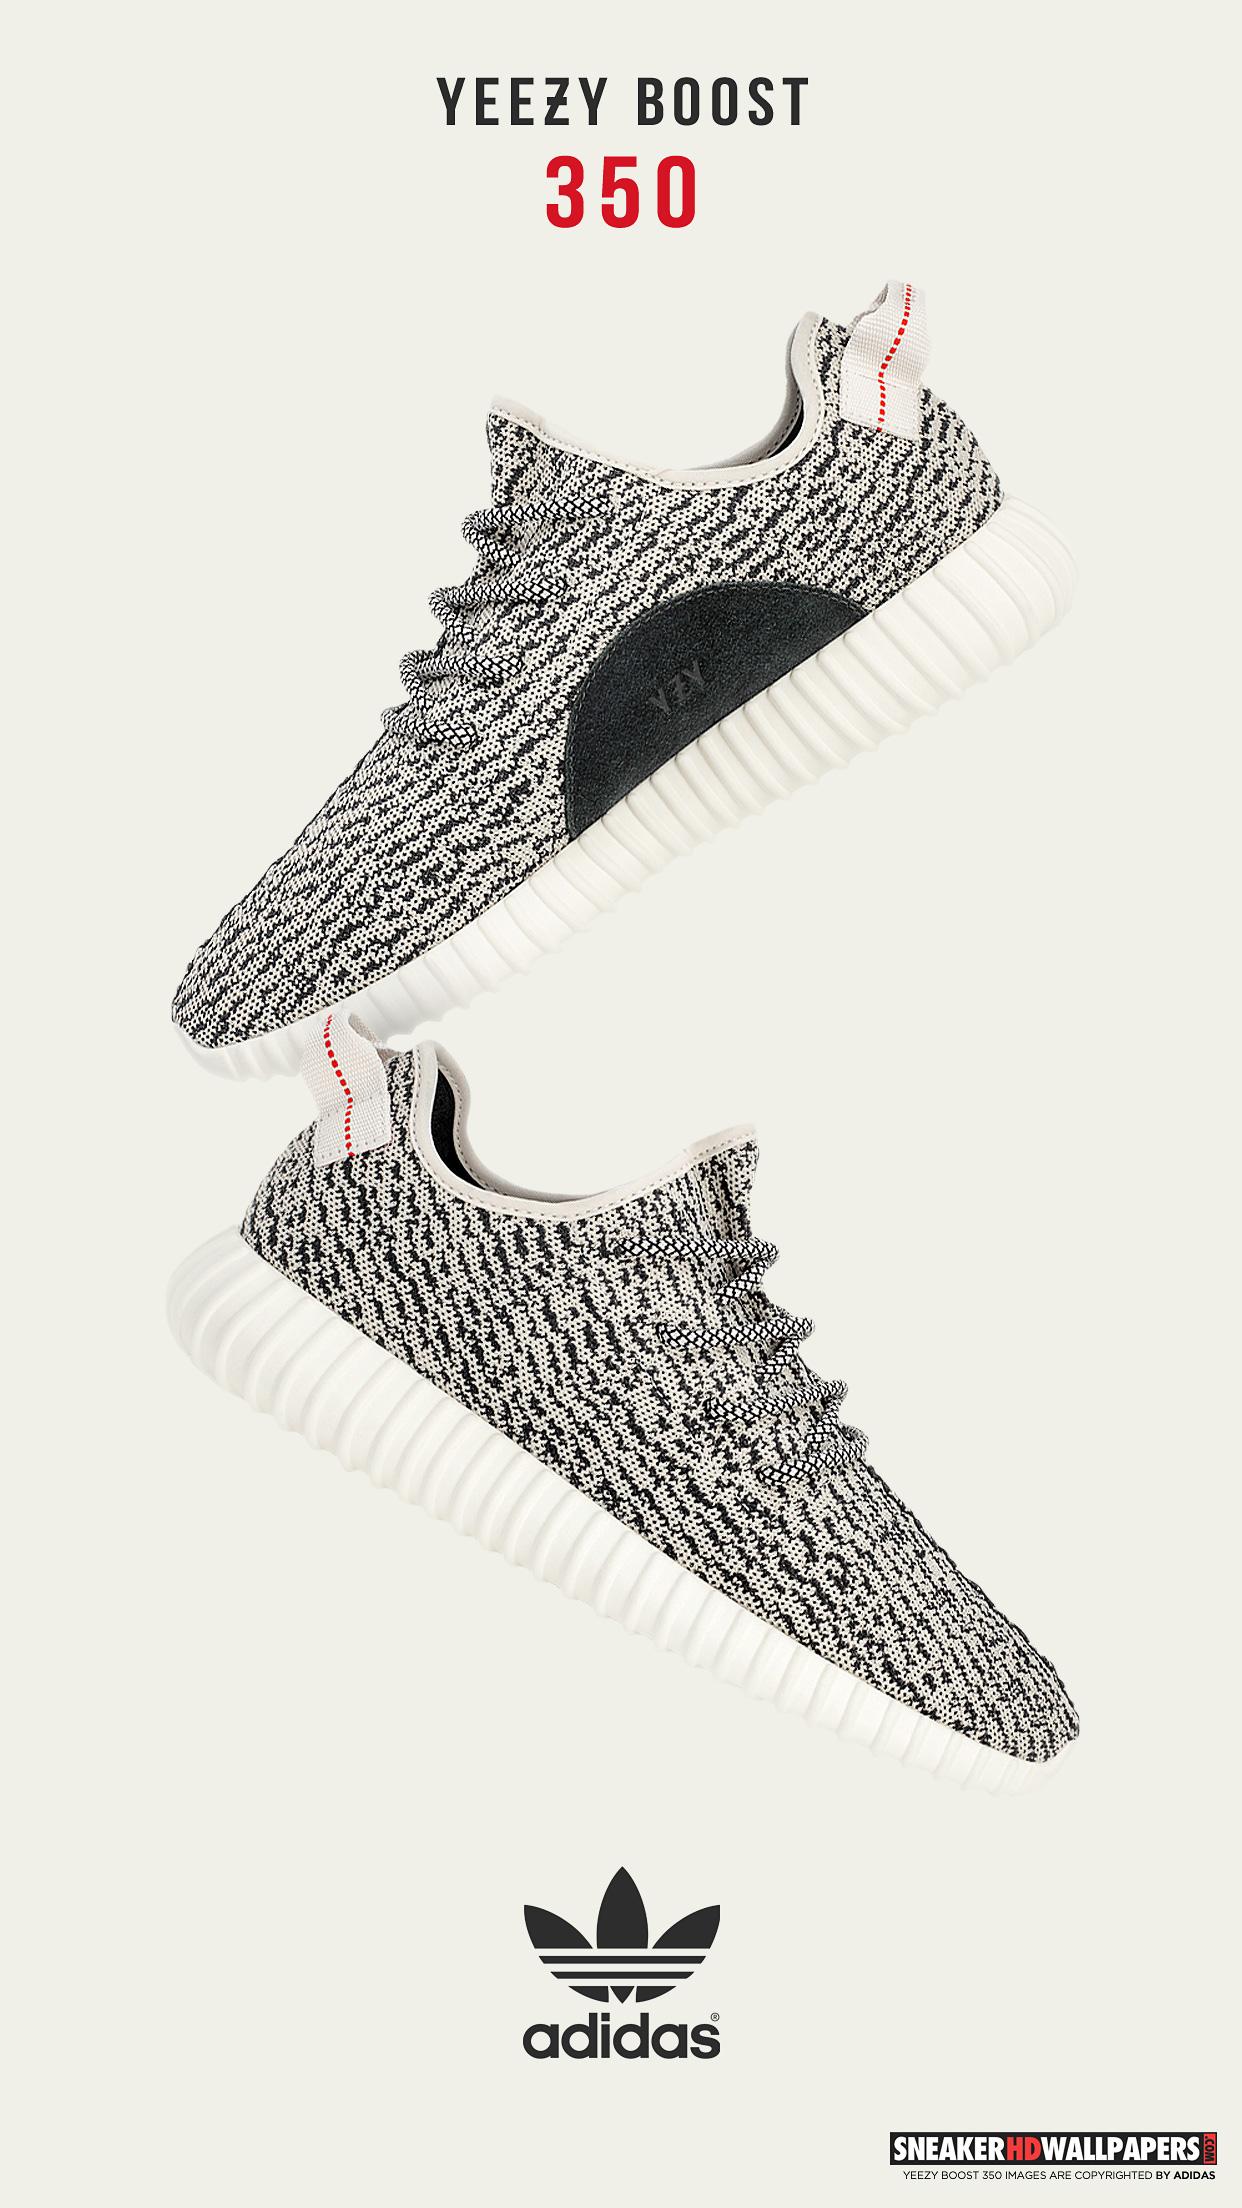 Sneakerhdwallpapers Your Favorite Sneakers In Hd And